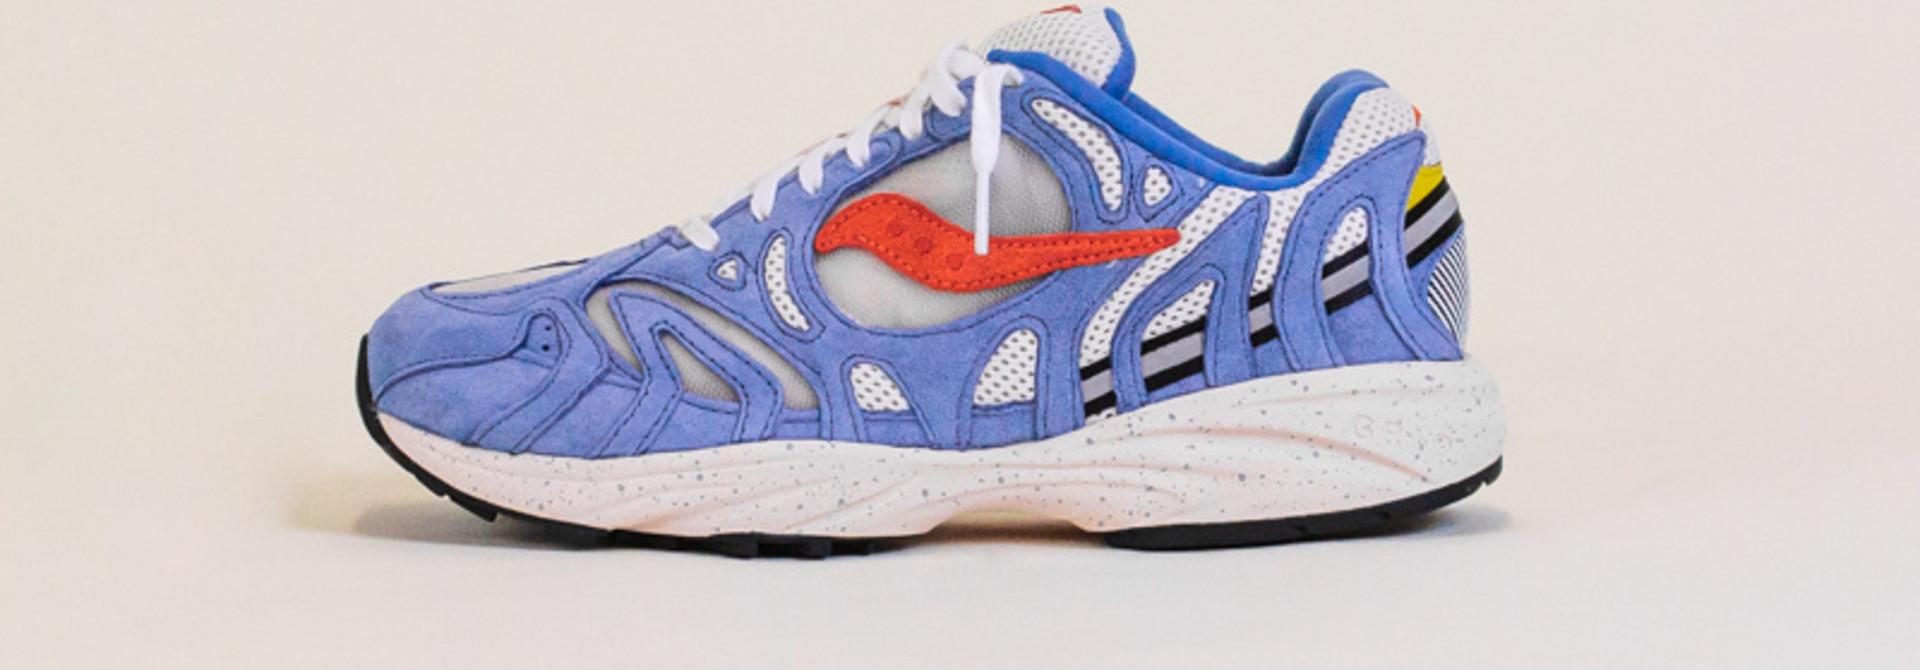 Saucony Grid Azura 2000 - Blue/Orange